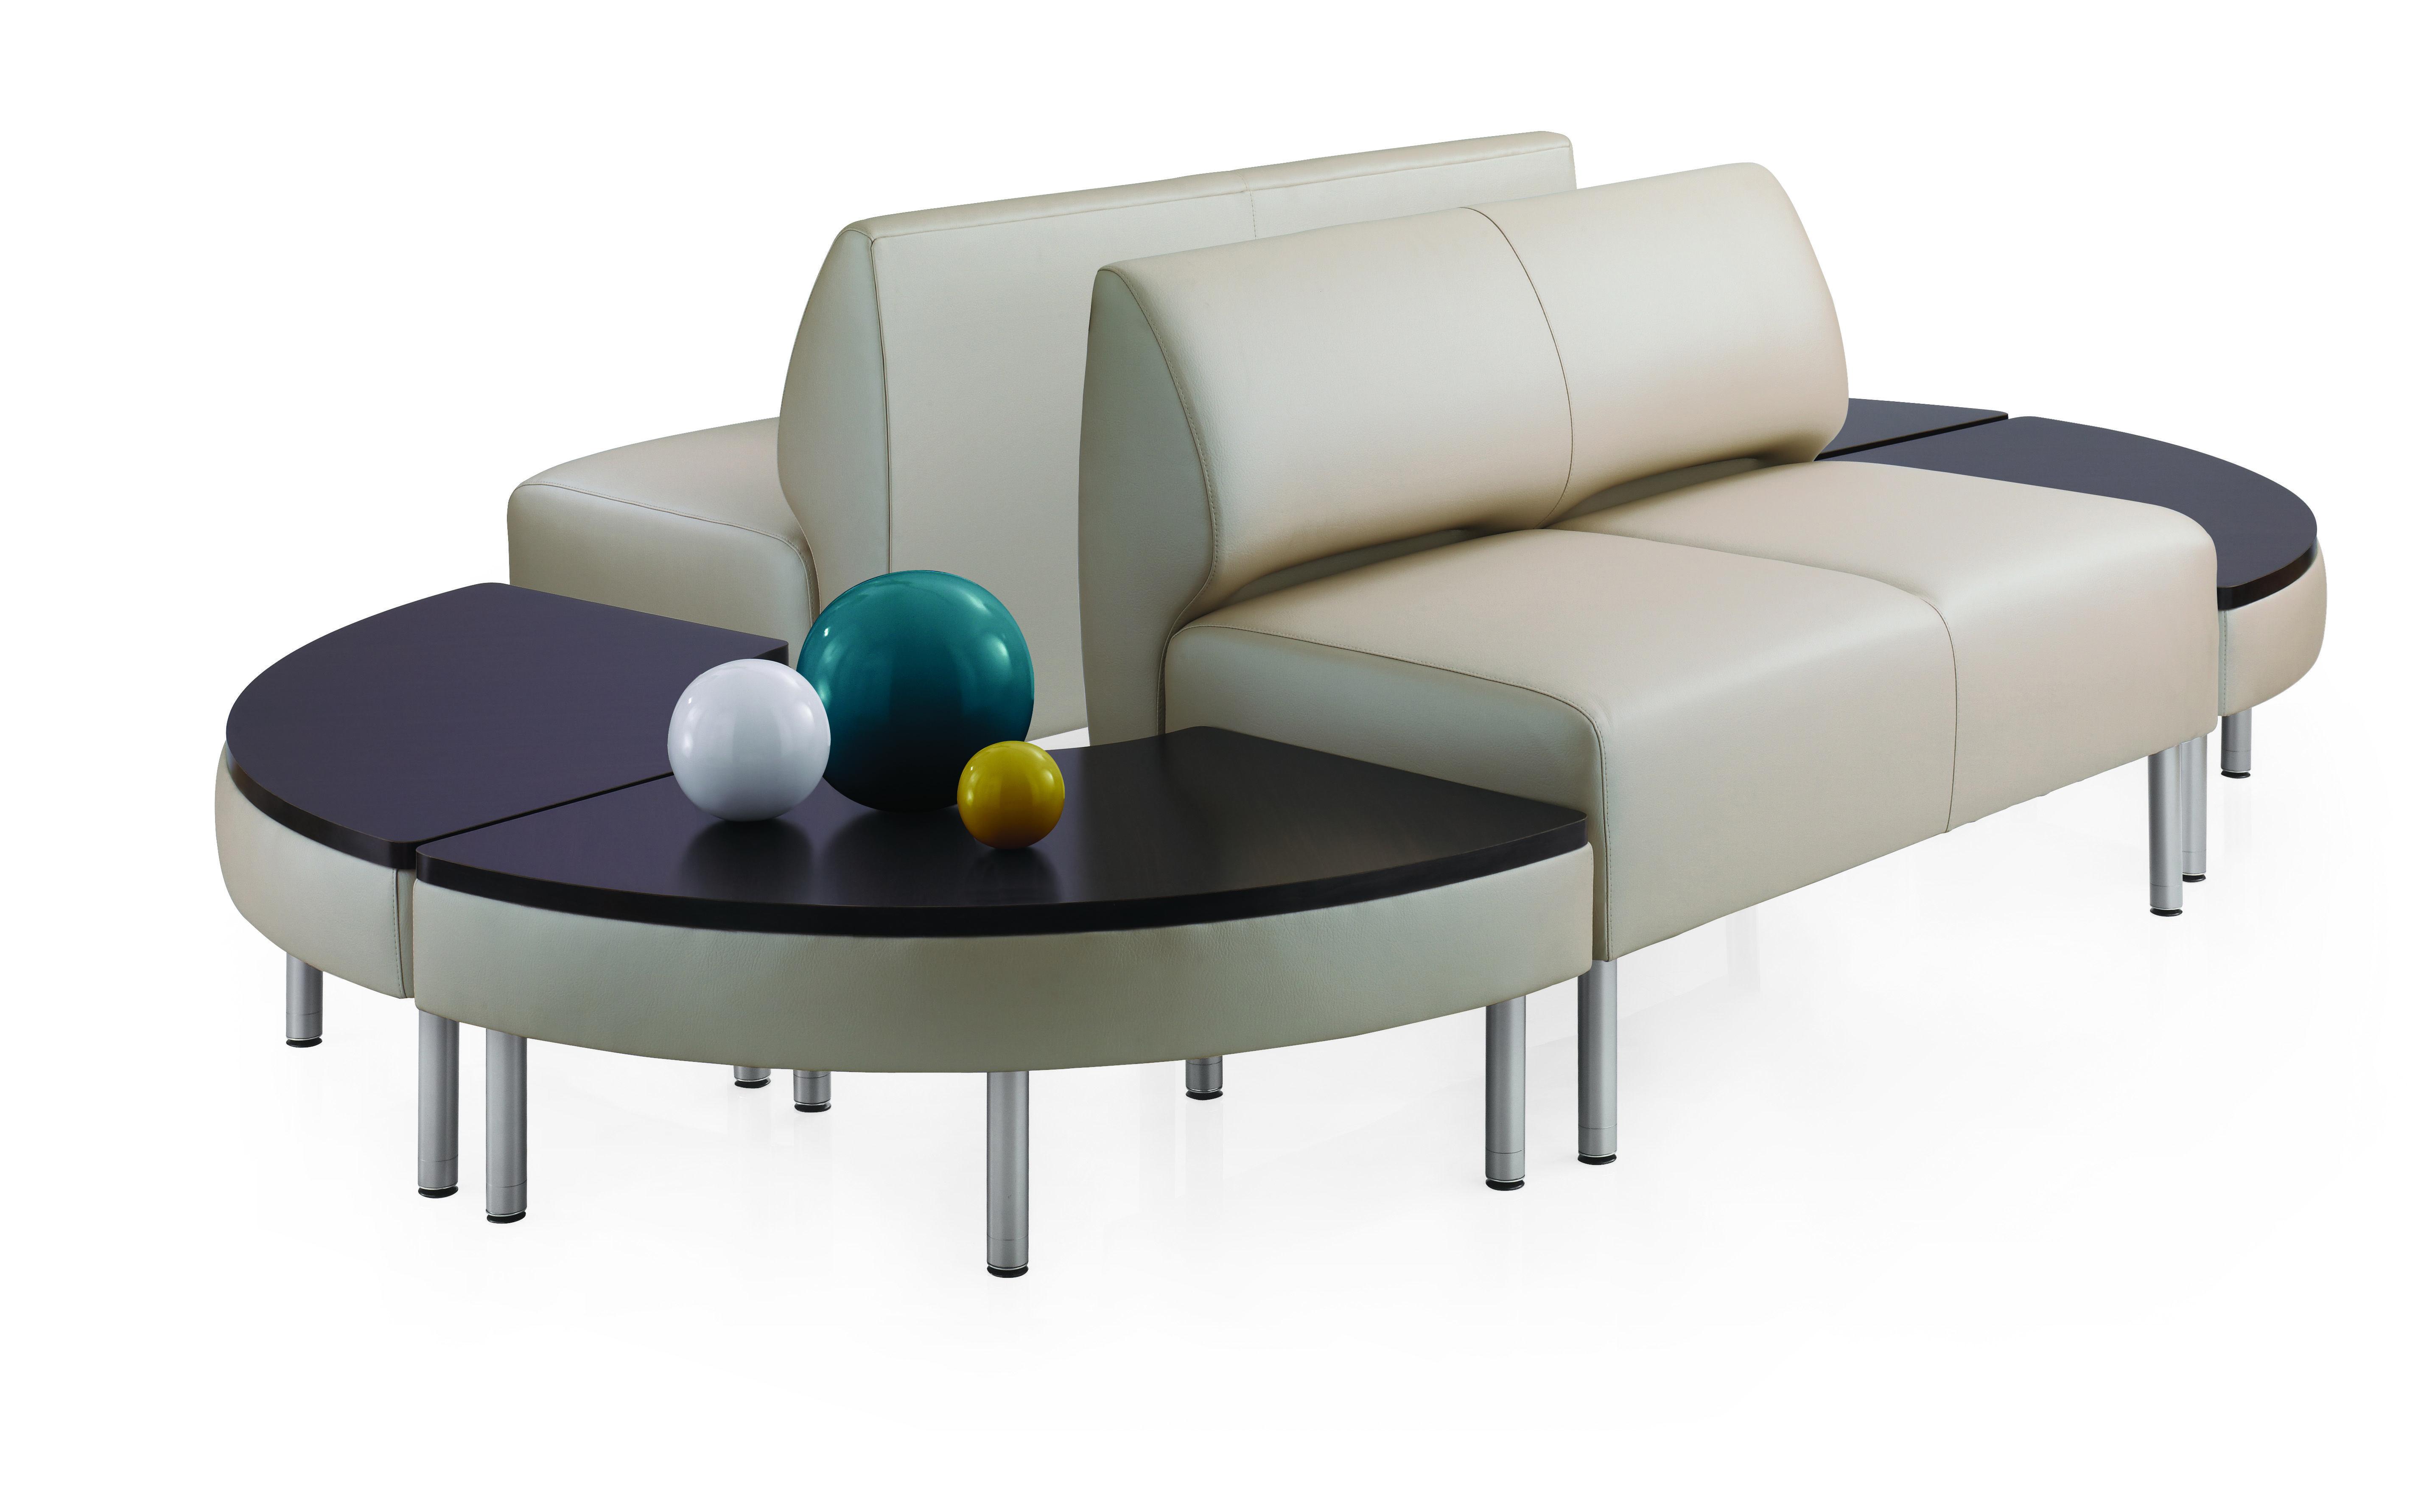 Etc. Modular Lounge | Patrician Furniture